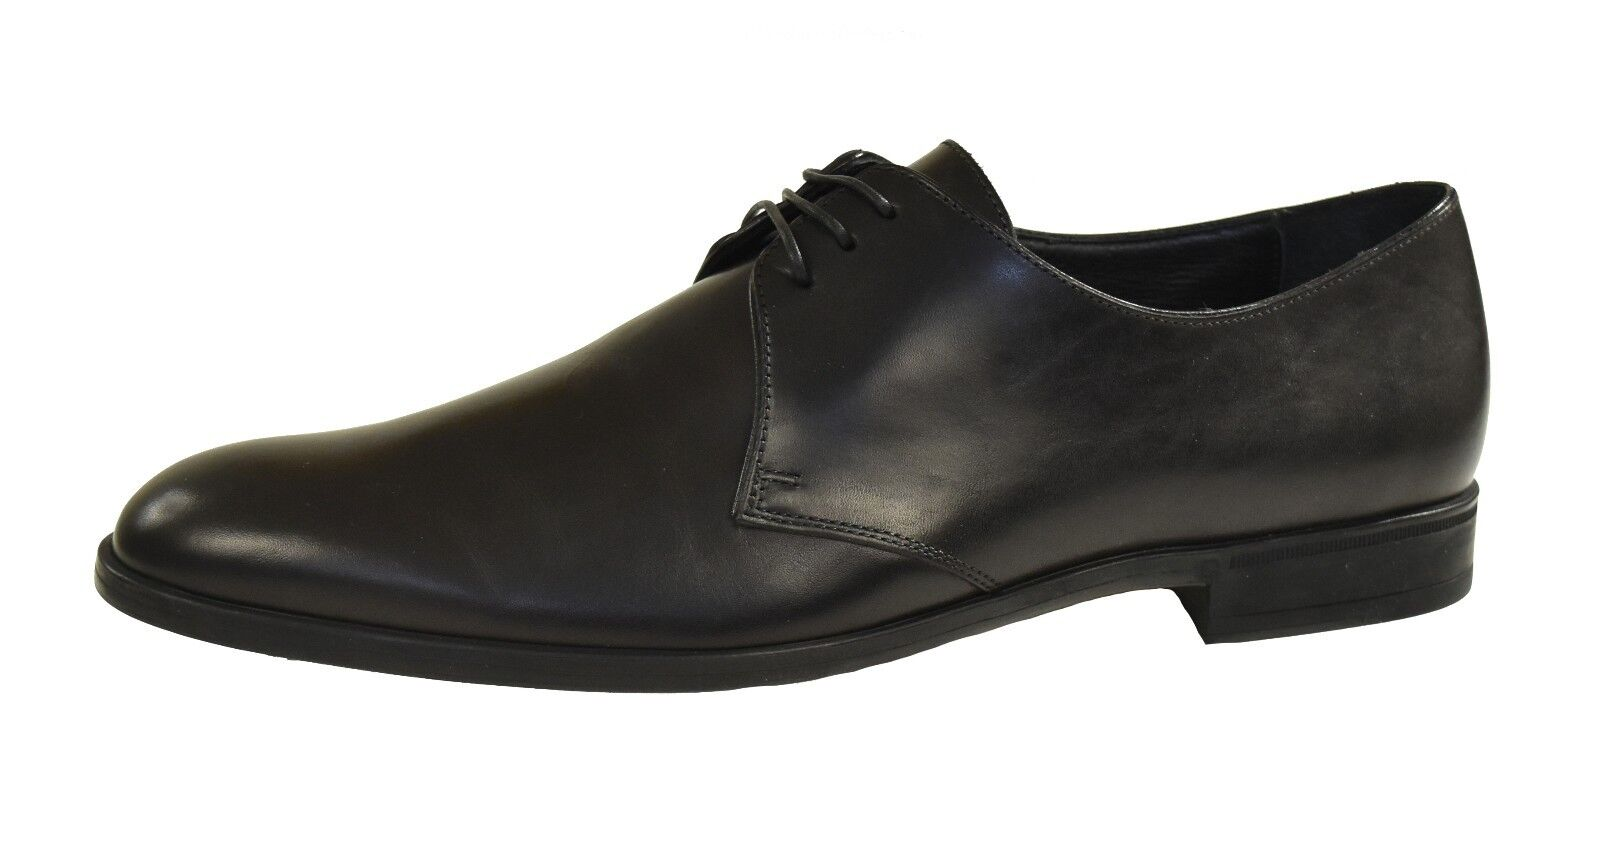 Ralph Lauren lila Label Schwarzes Leder Leder Leder Whickham Oxford Schuh Schuhe Neu ade091